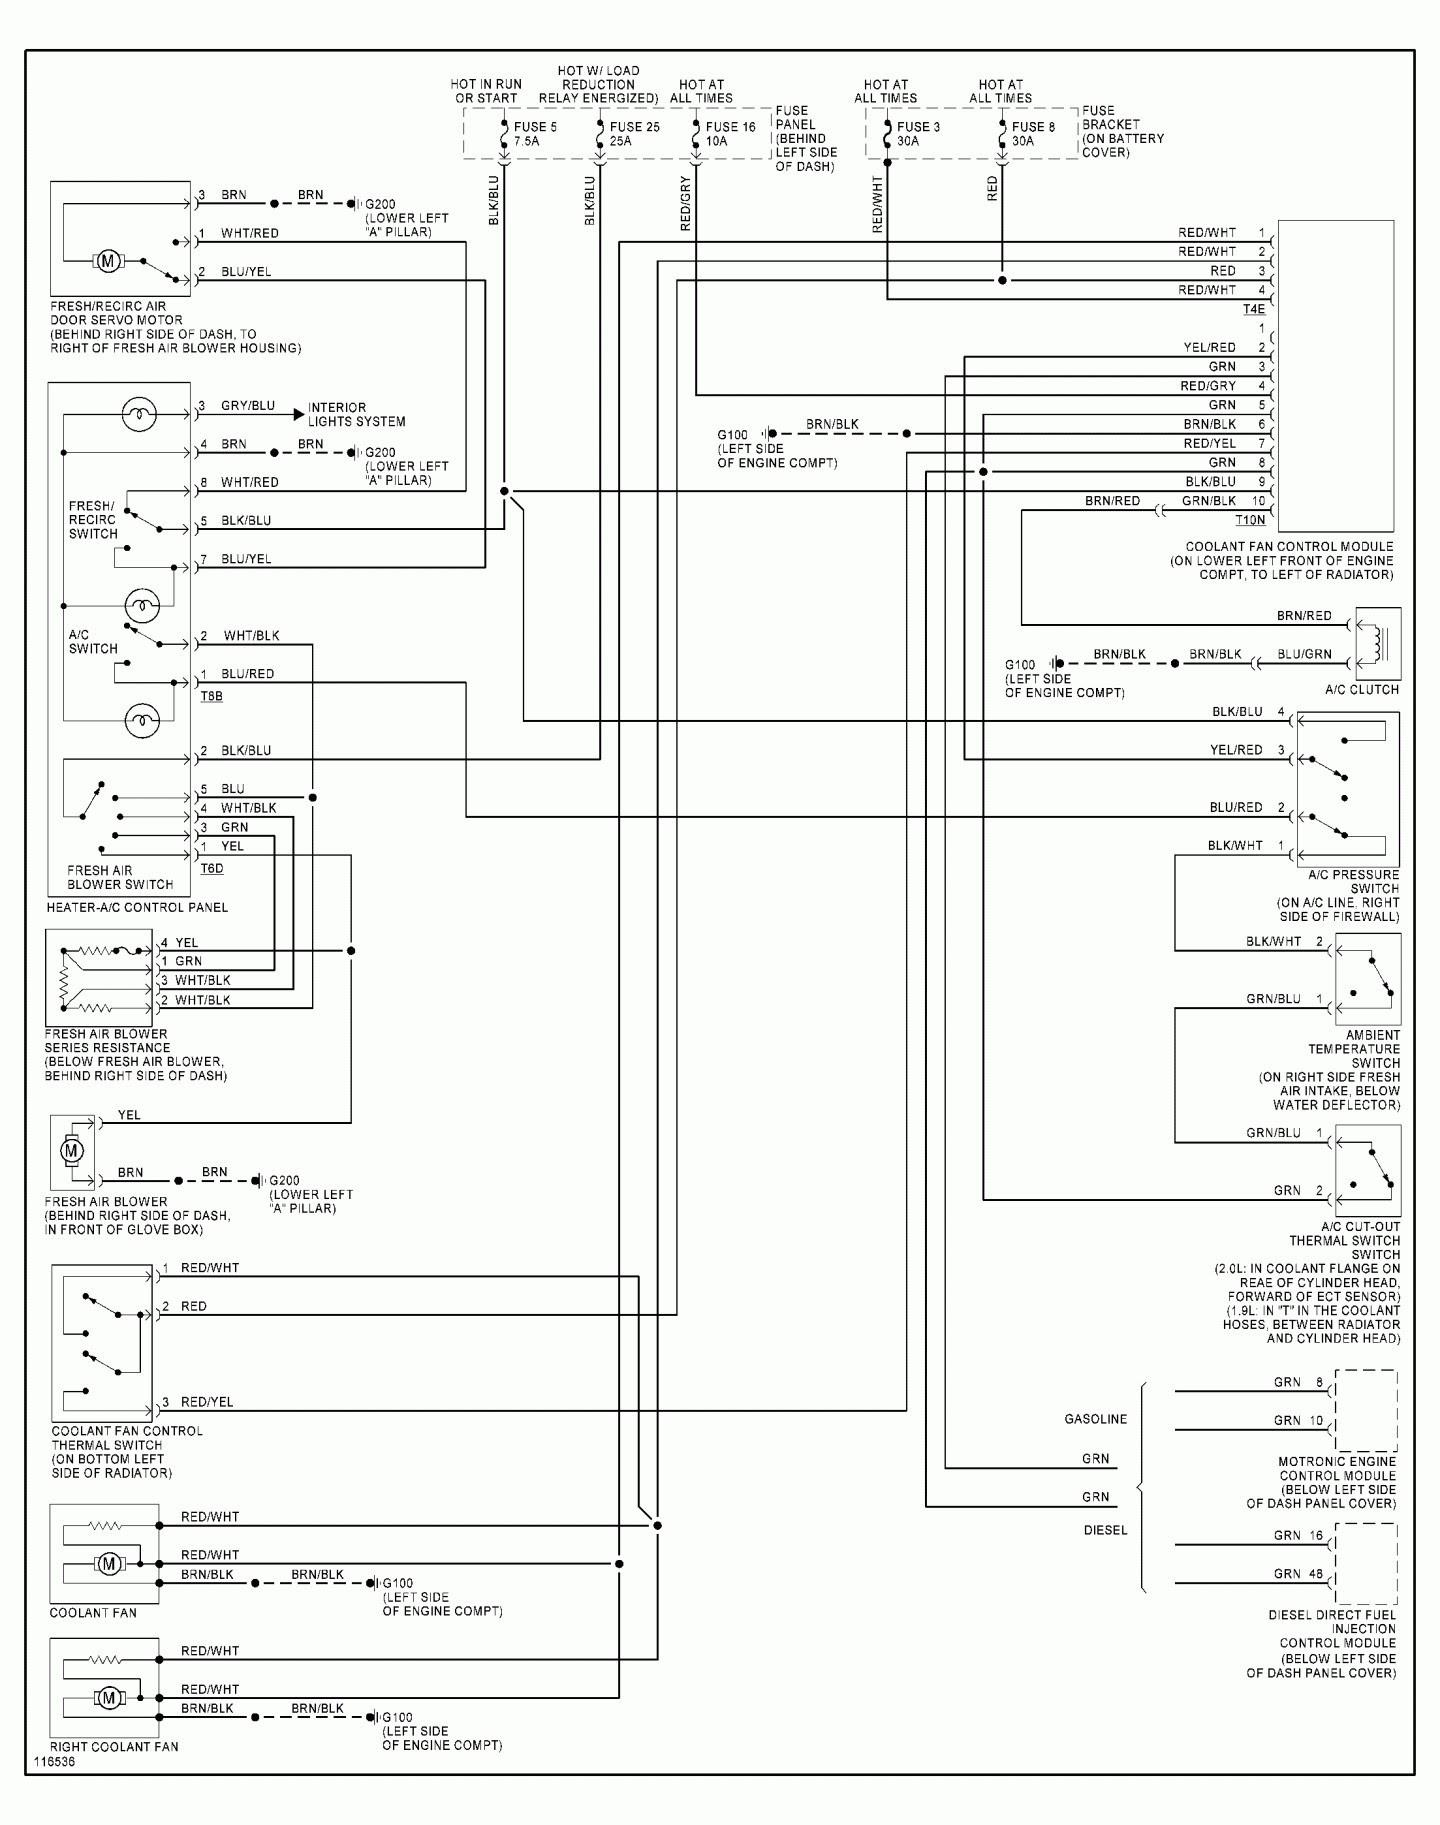 2001 Vw Gti Wiring Diagram Wiring Diagram Dress Overview Dress Overview Lasuiteclub It